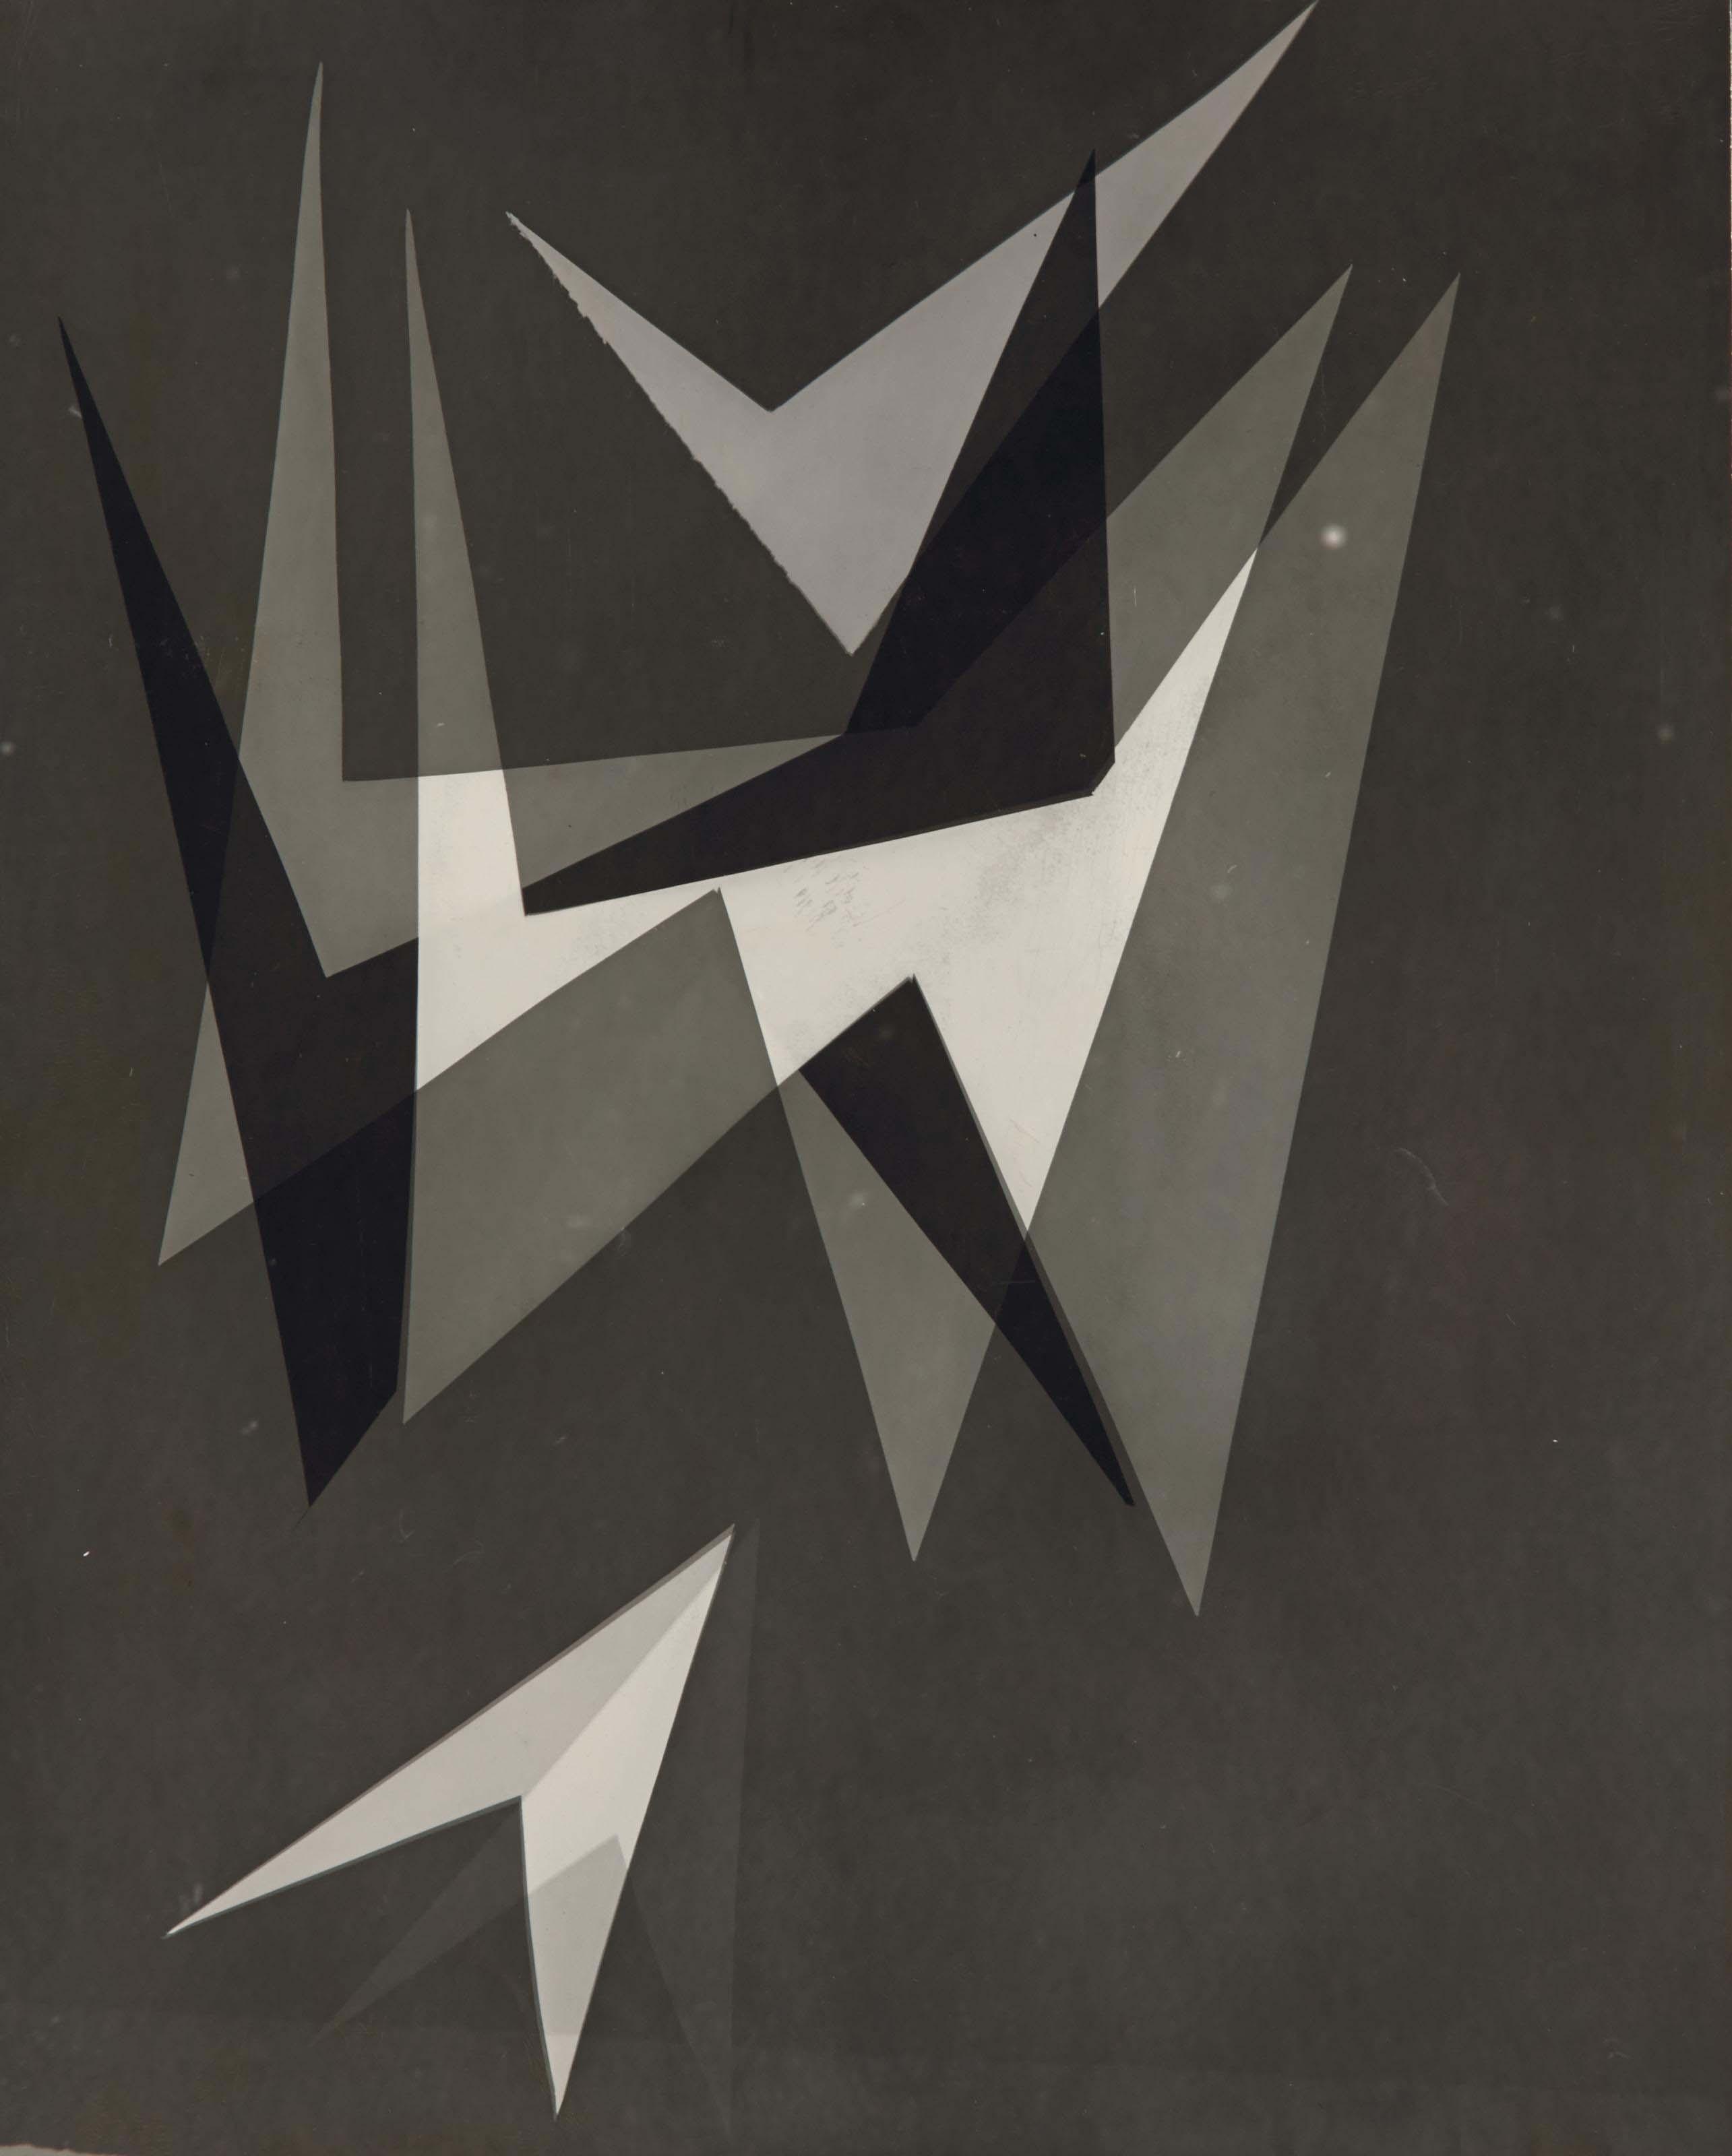 Untitled, 1946-1947